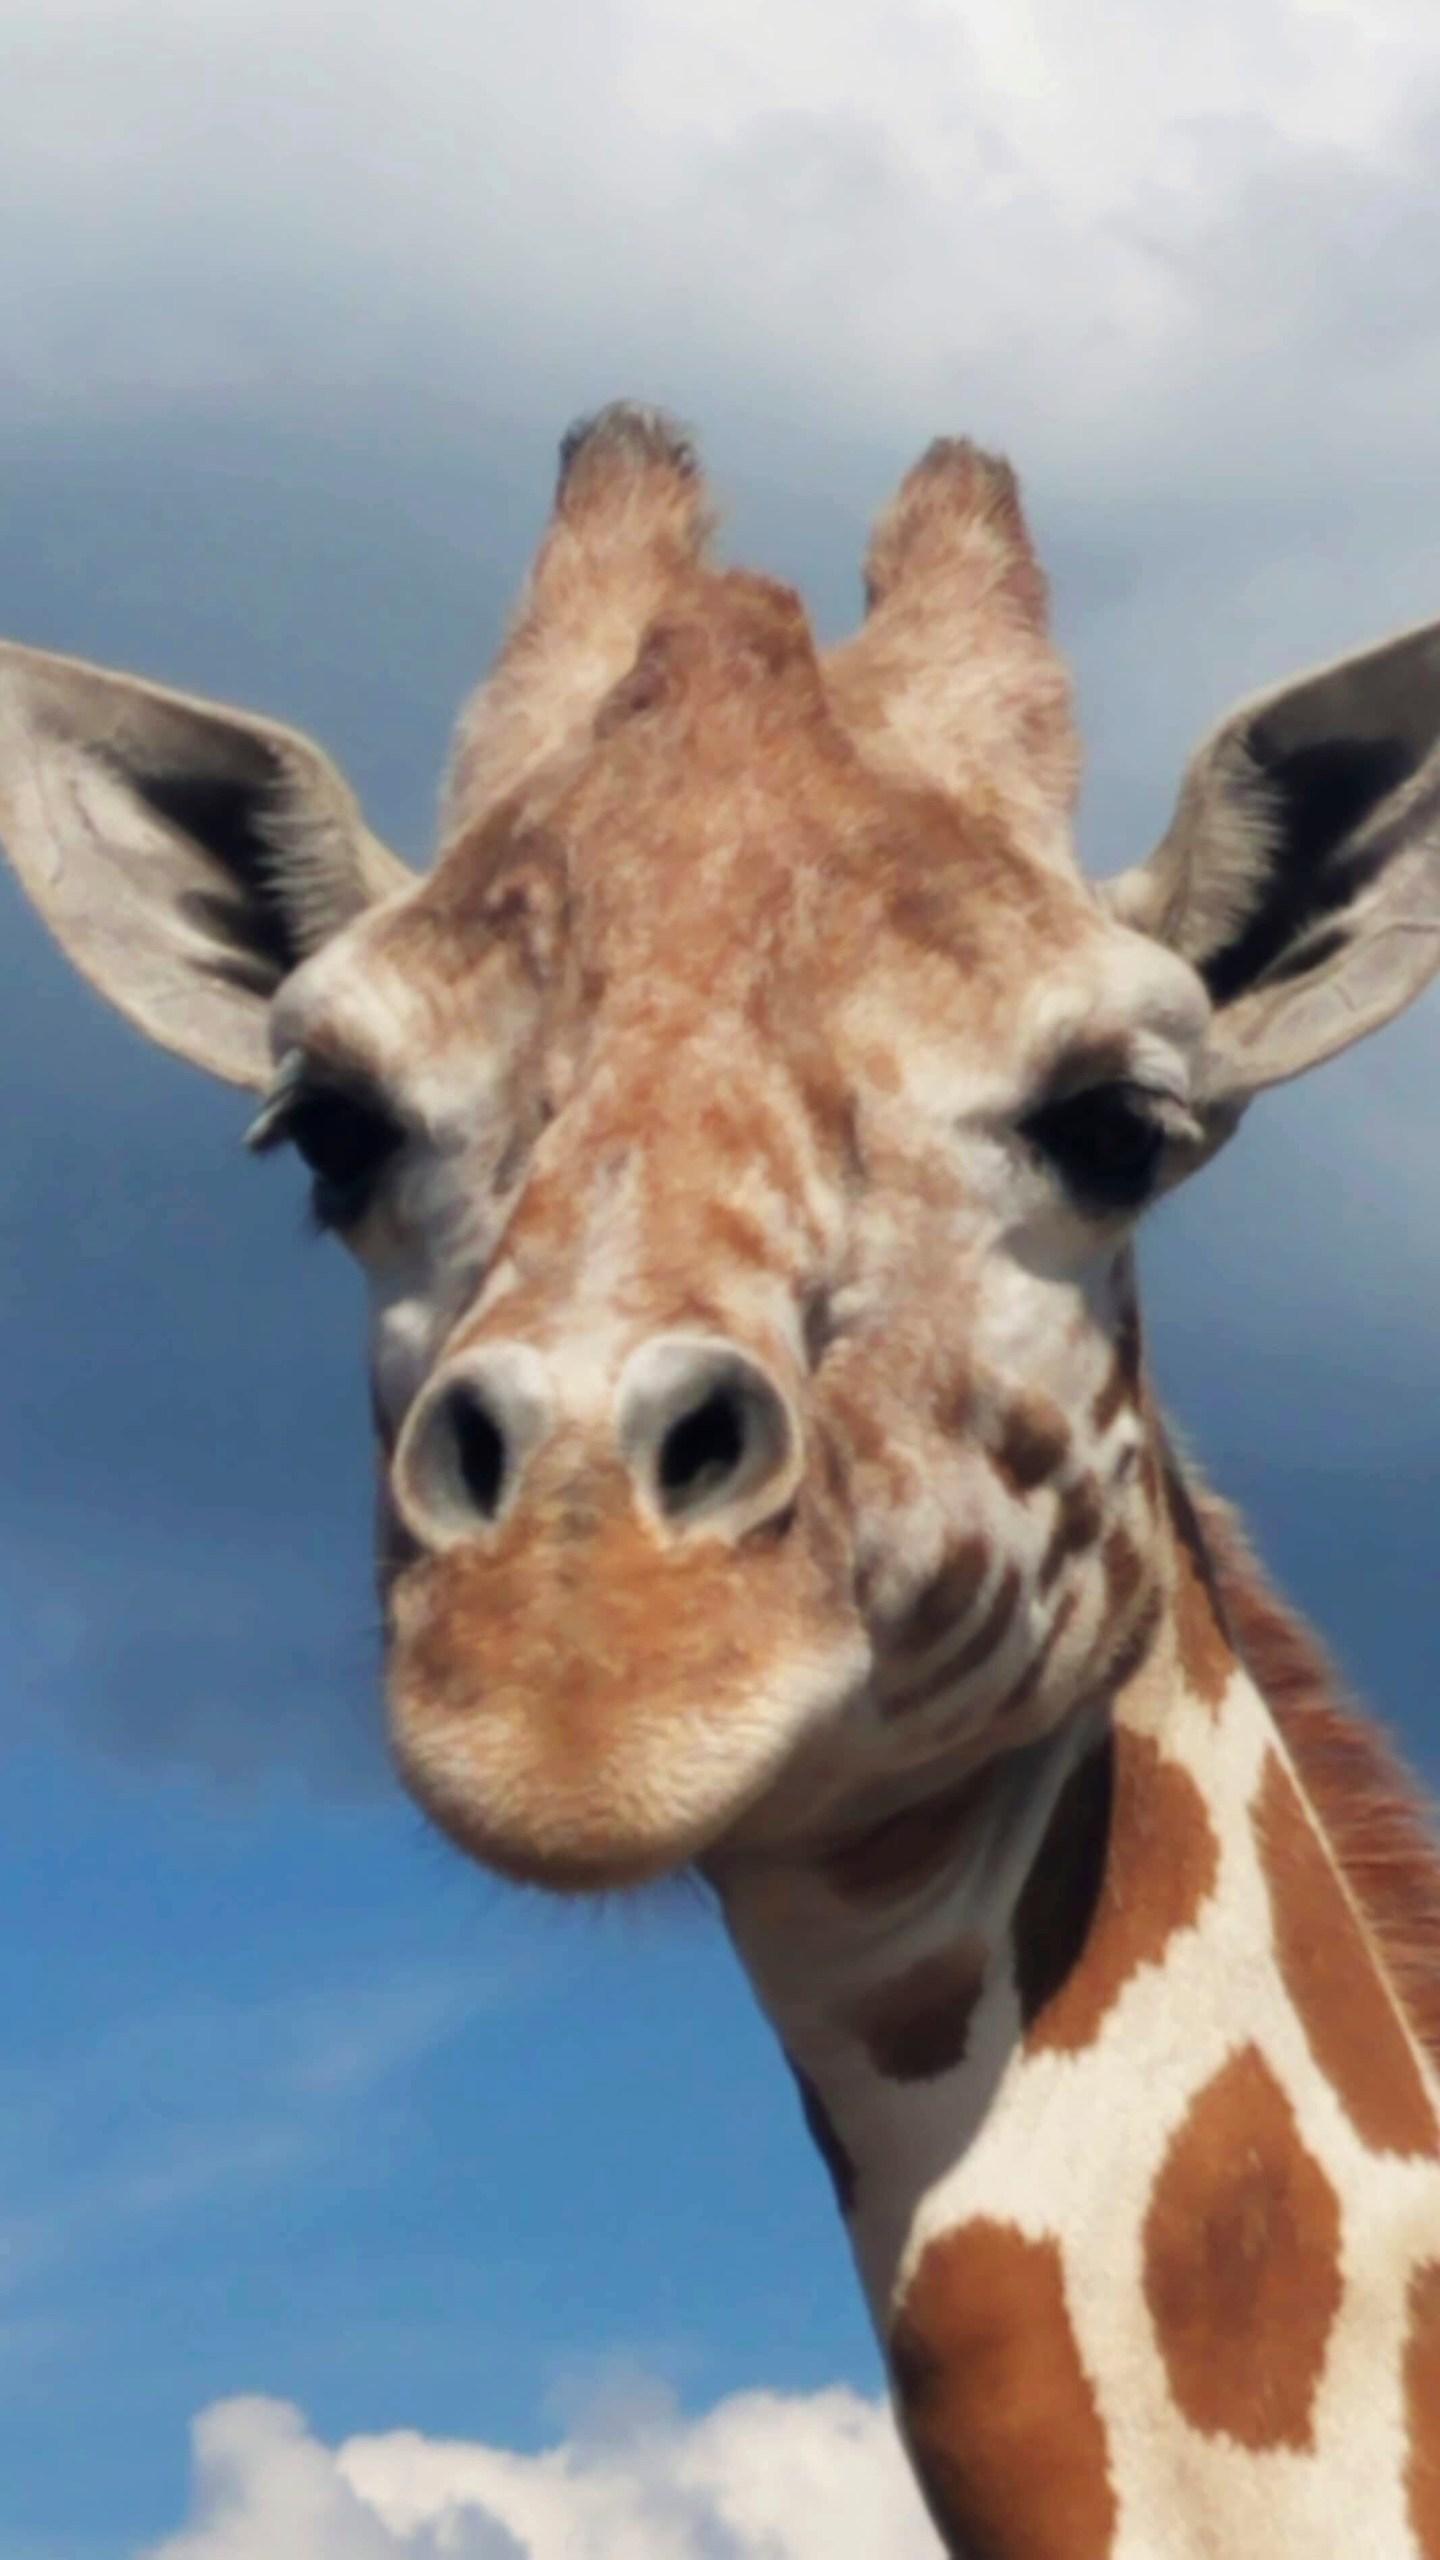 April_the_Giraffe_09023-159532.jpg29199223